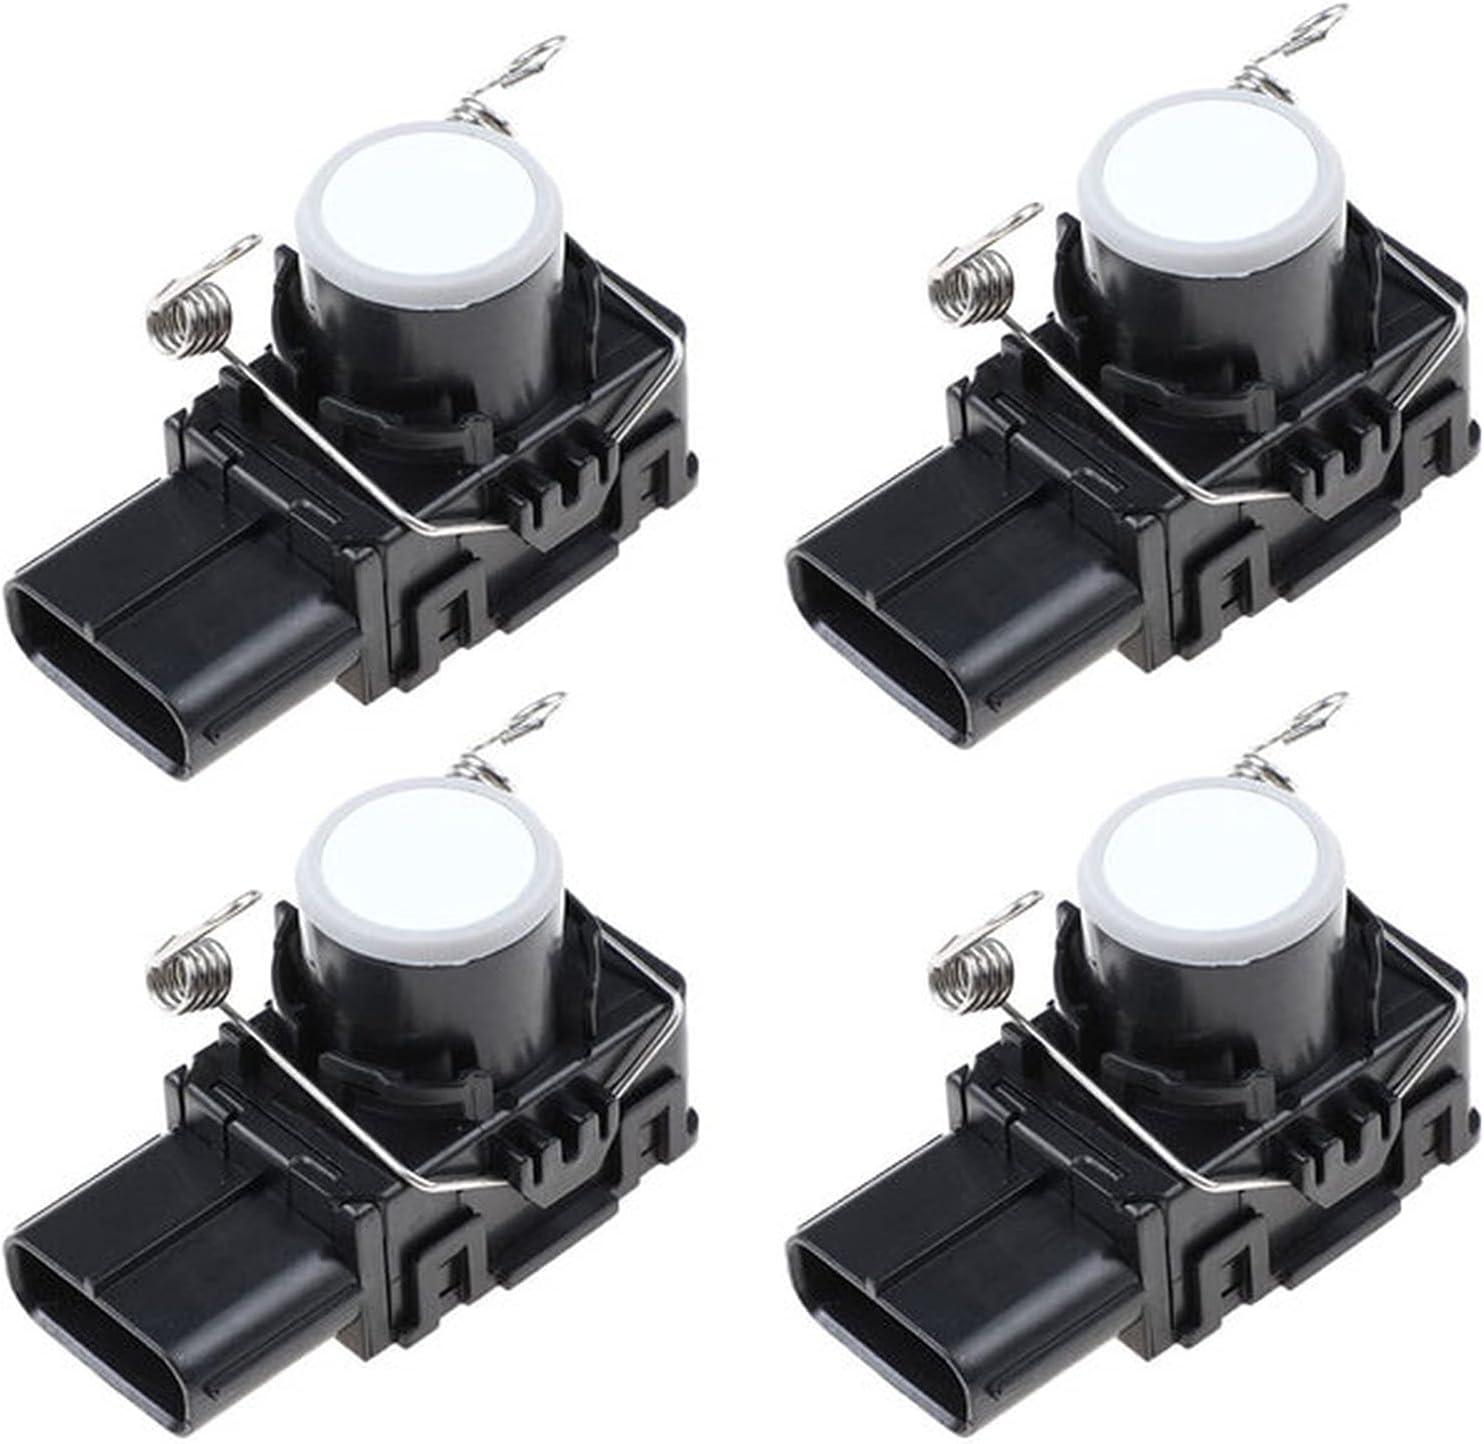 GLLXPZ 4PCS Reversing Radar Parking Land for 70% OFF Outlet Toyota Crui Great interest Sensor